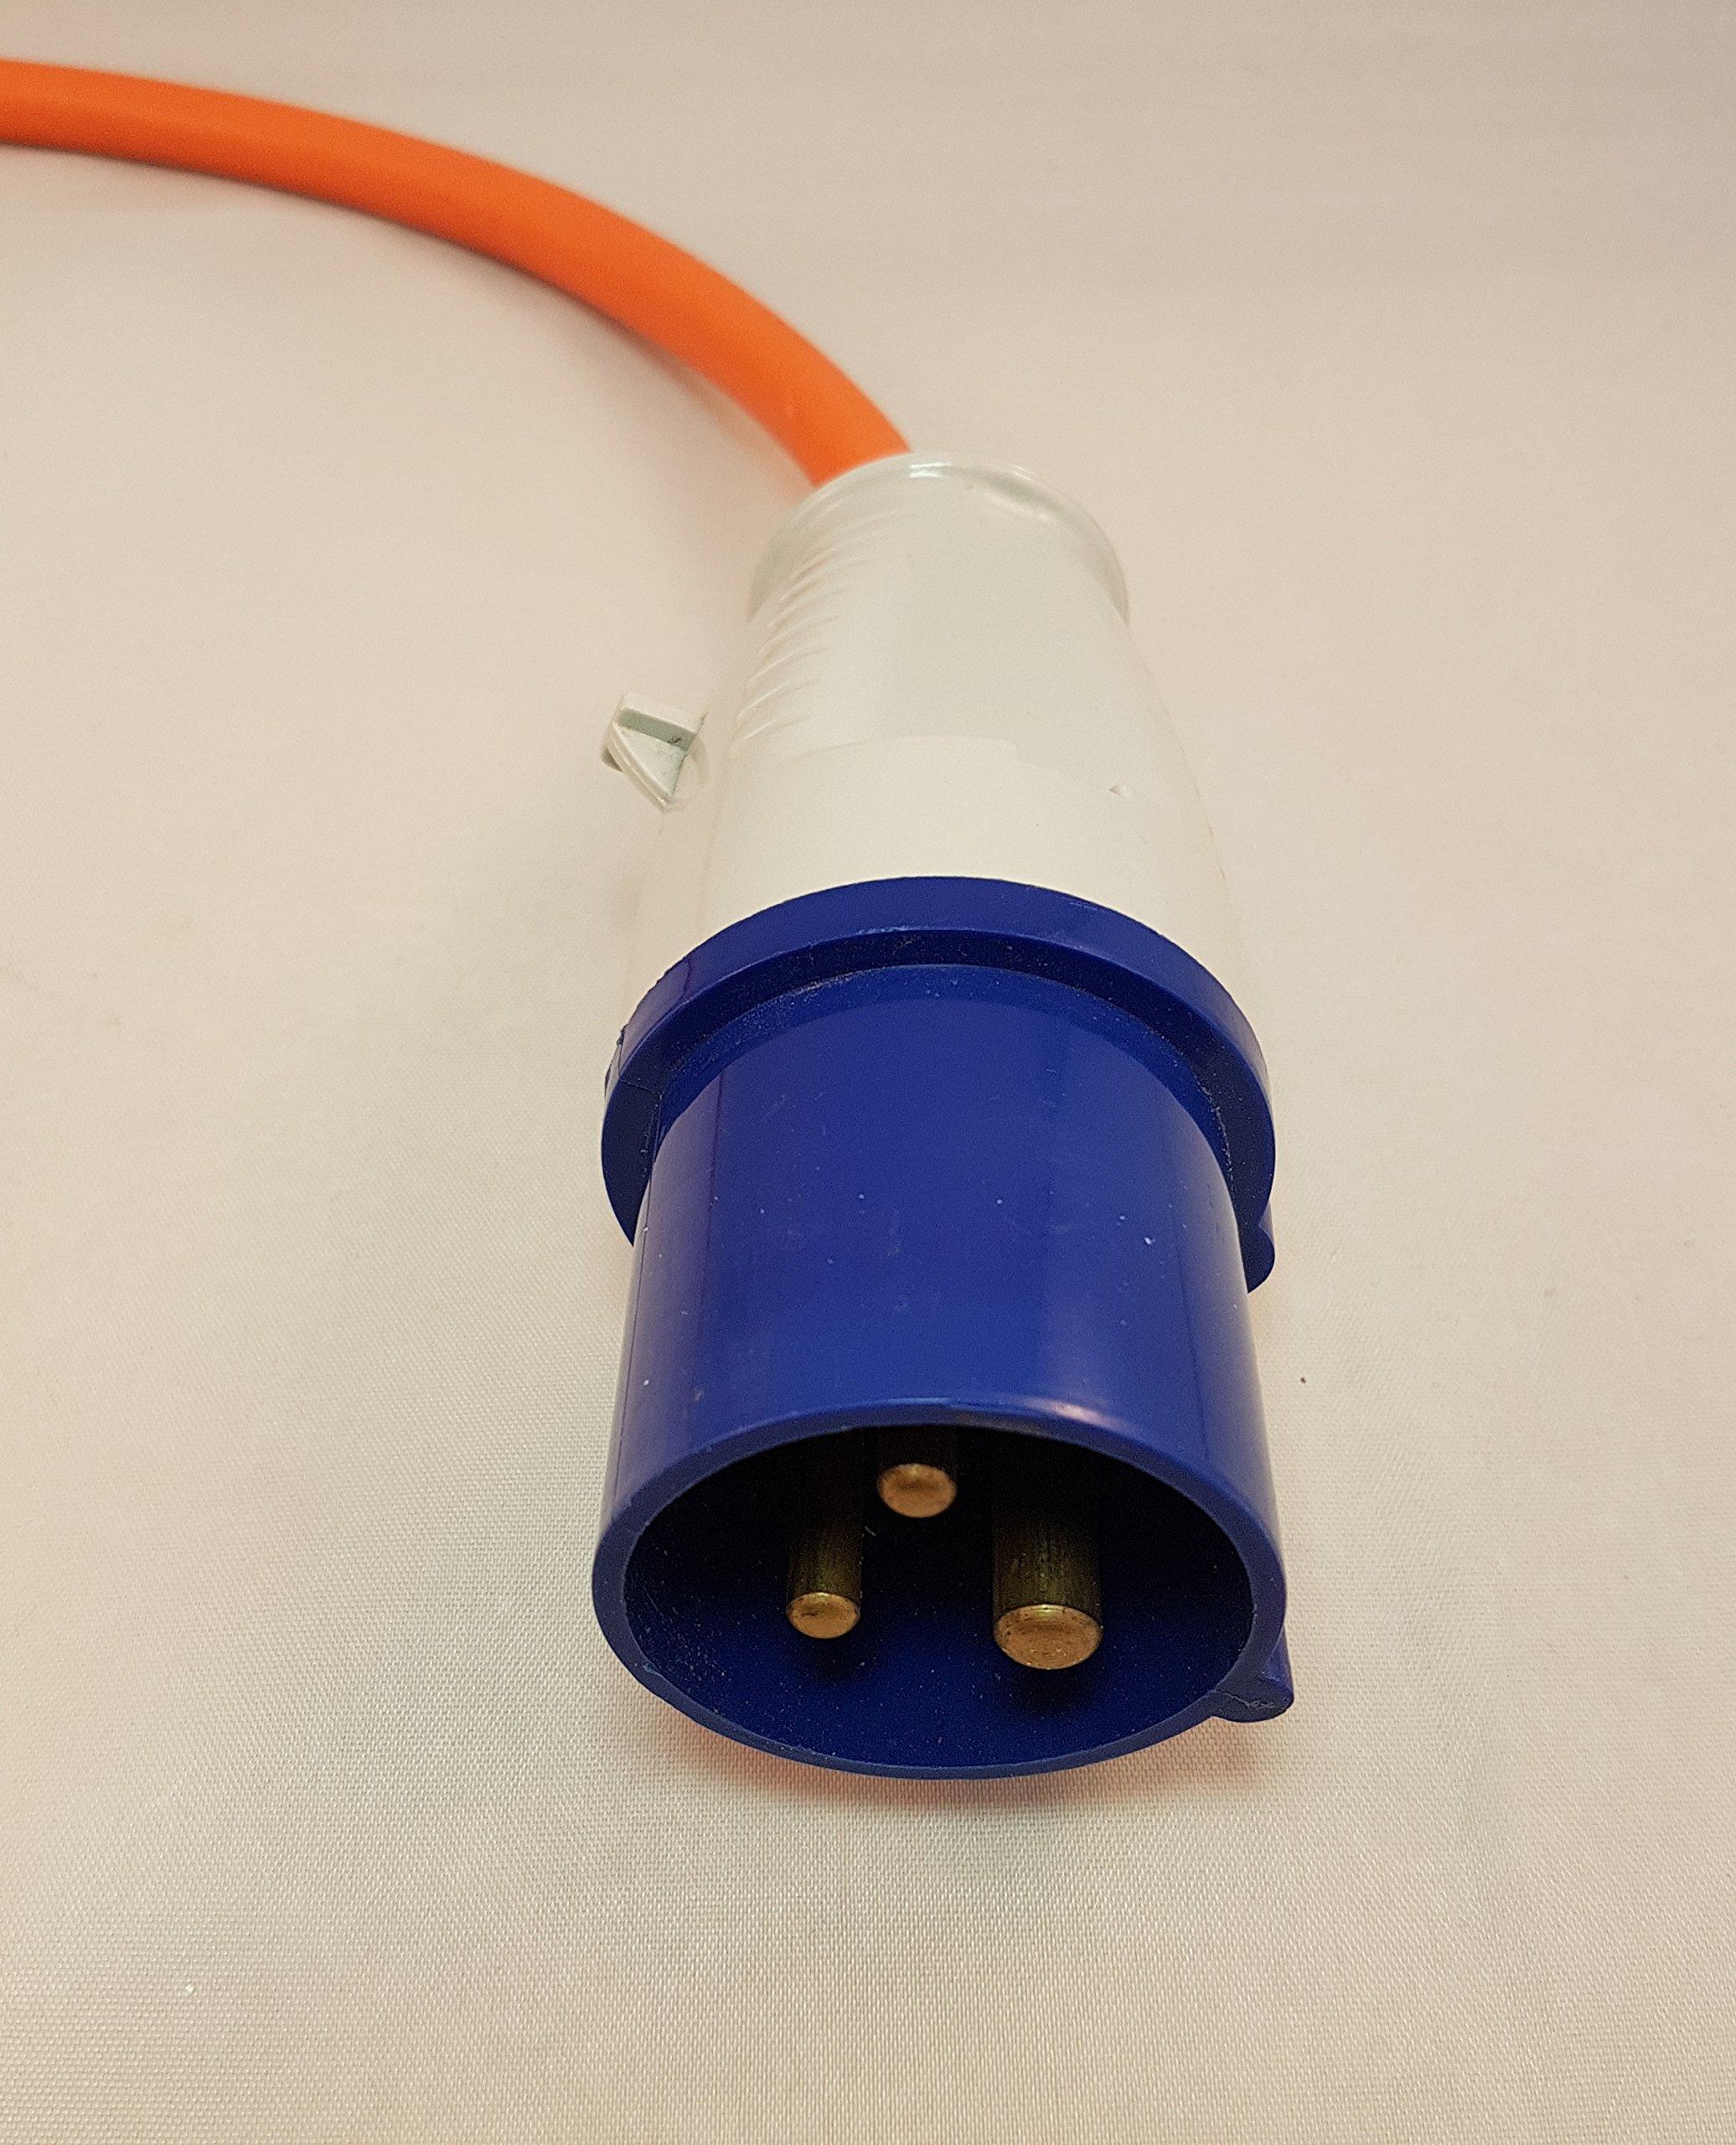 3D Cabin 16amp corrente elettrica spina antipolvere per camper/caravan/camping collegamento cavo: Blu